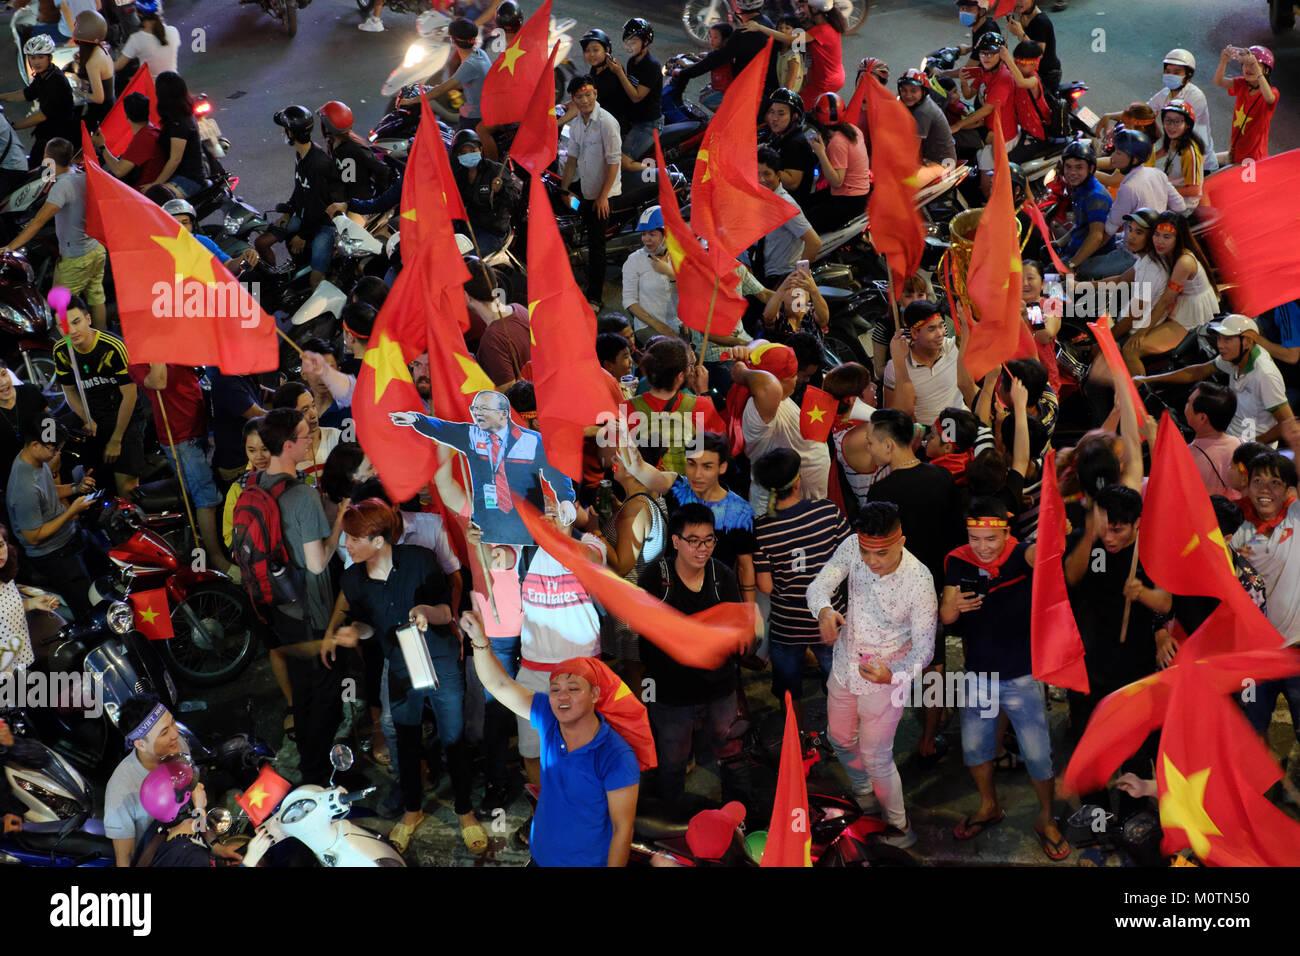 HO CHI MINH CITY, VIET NAM, Crowd of Vietnamese football